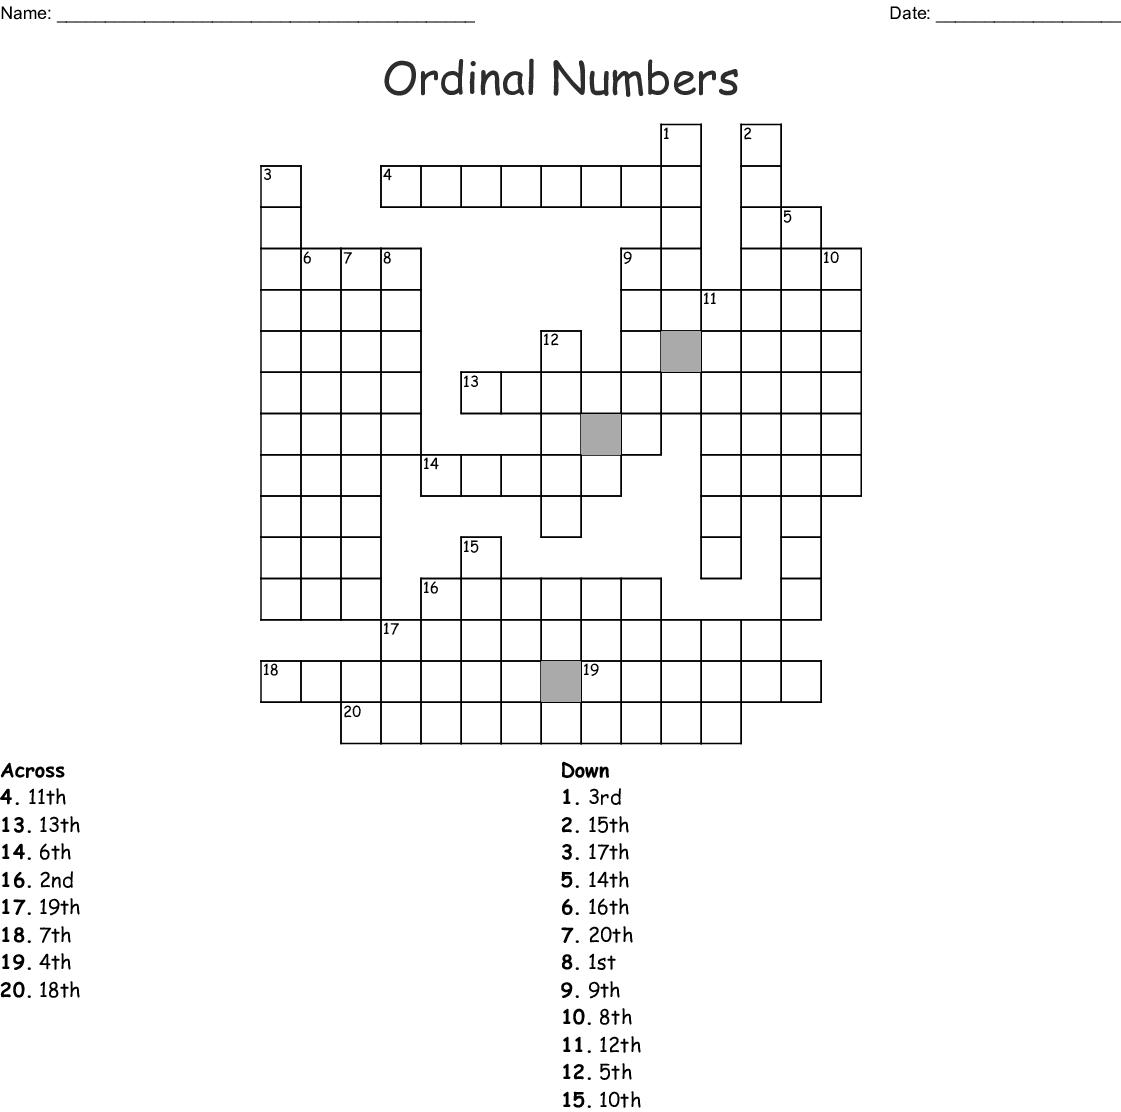 Ordinal Numbers Crossword